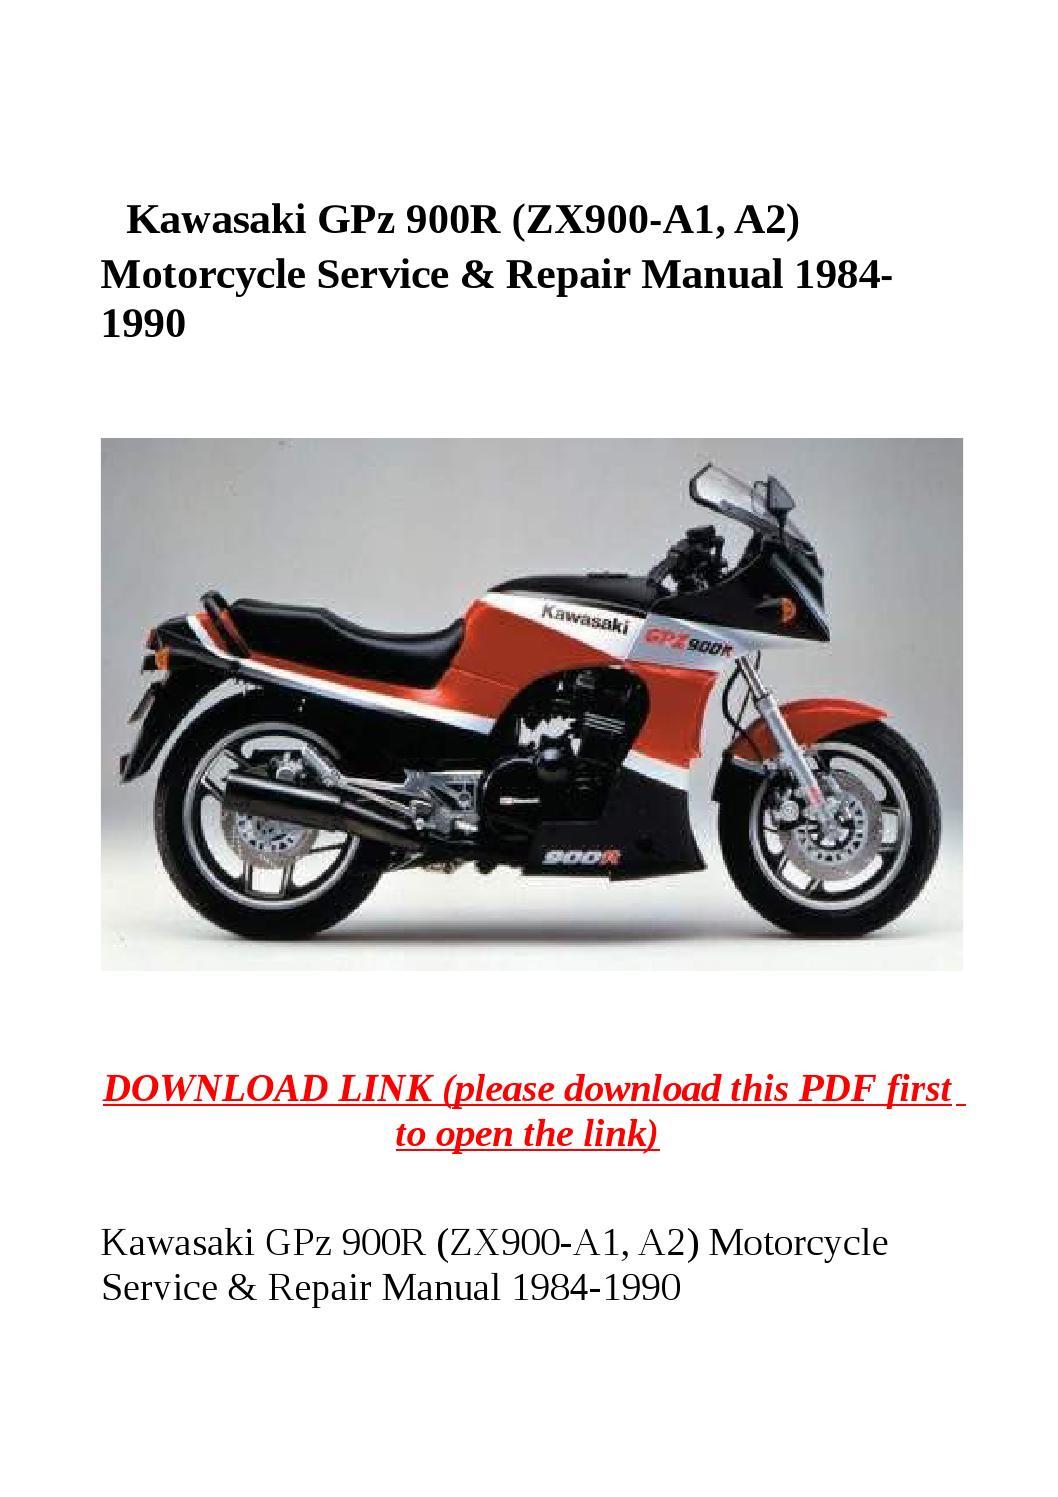 kawasaki gpz 900r (zx900 a1, a2) motorcycle service & repair manual 1984  1990